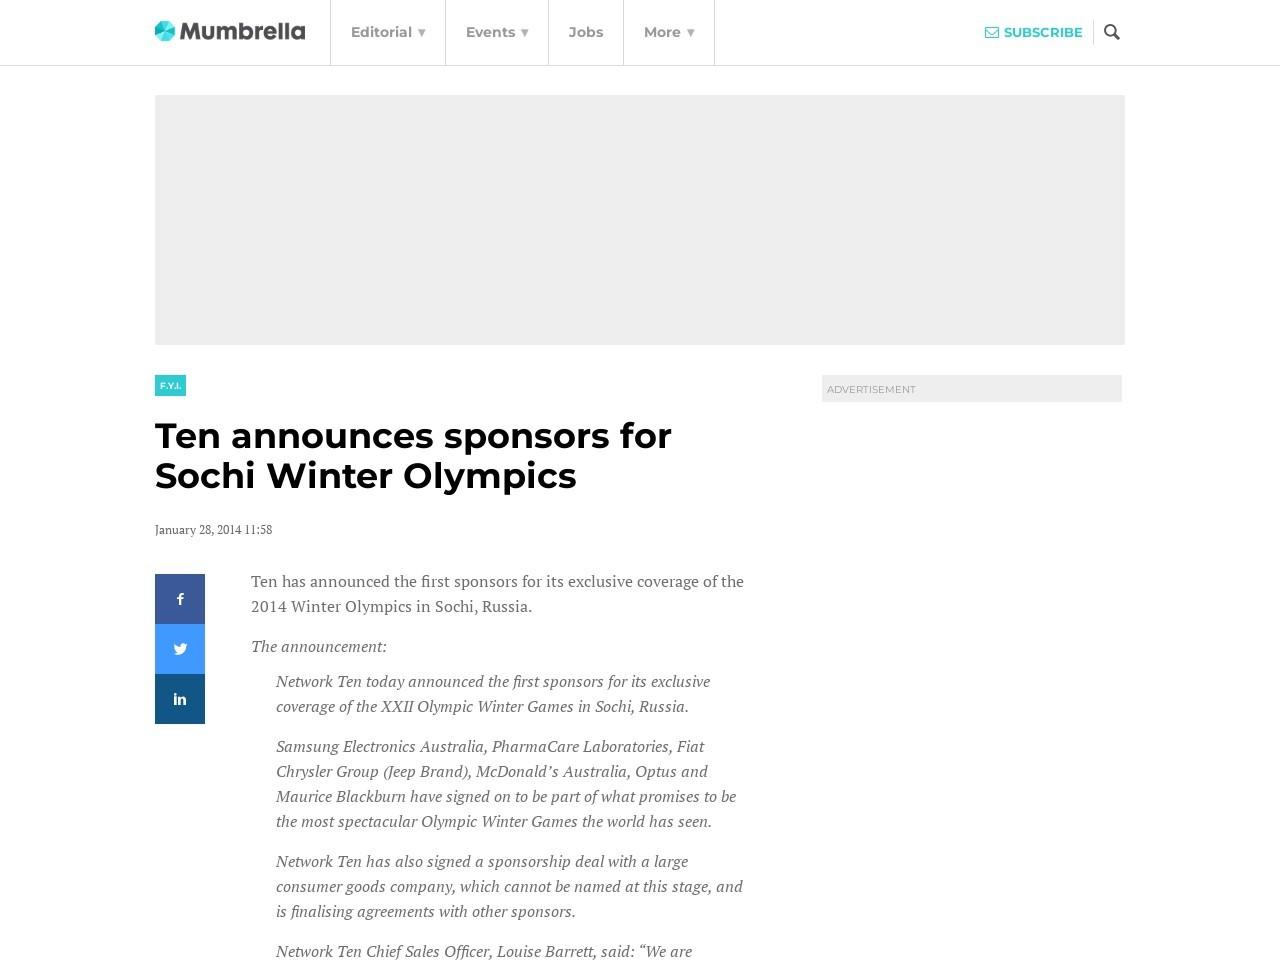 Ten announces sponsors for Sochi Winter Olympics – mUmBRELLA